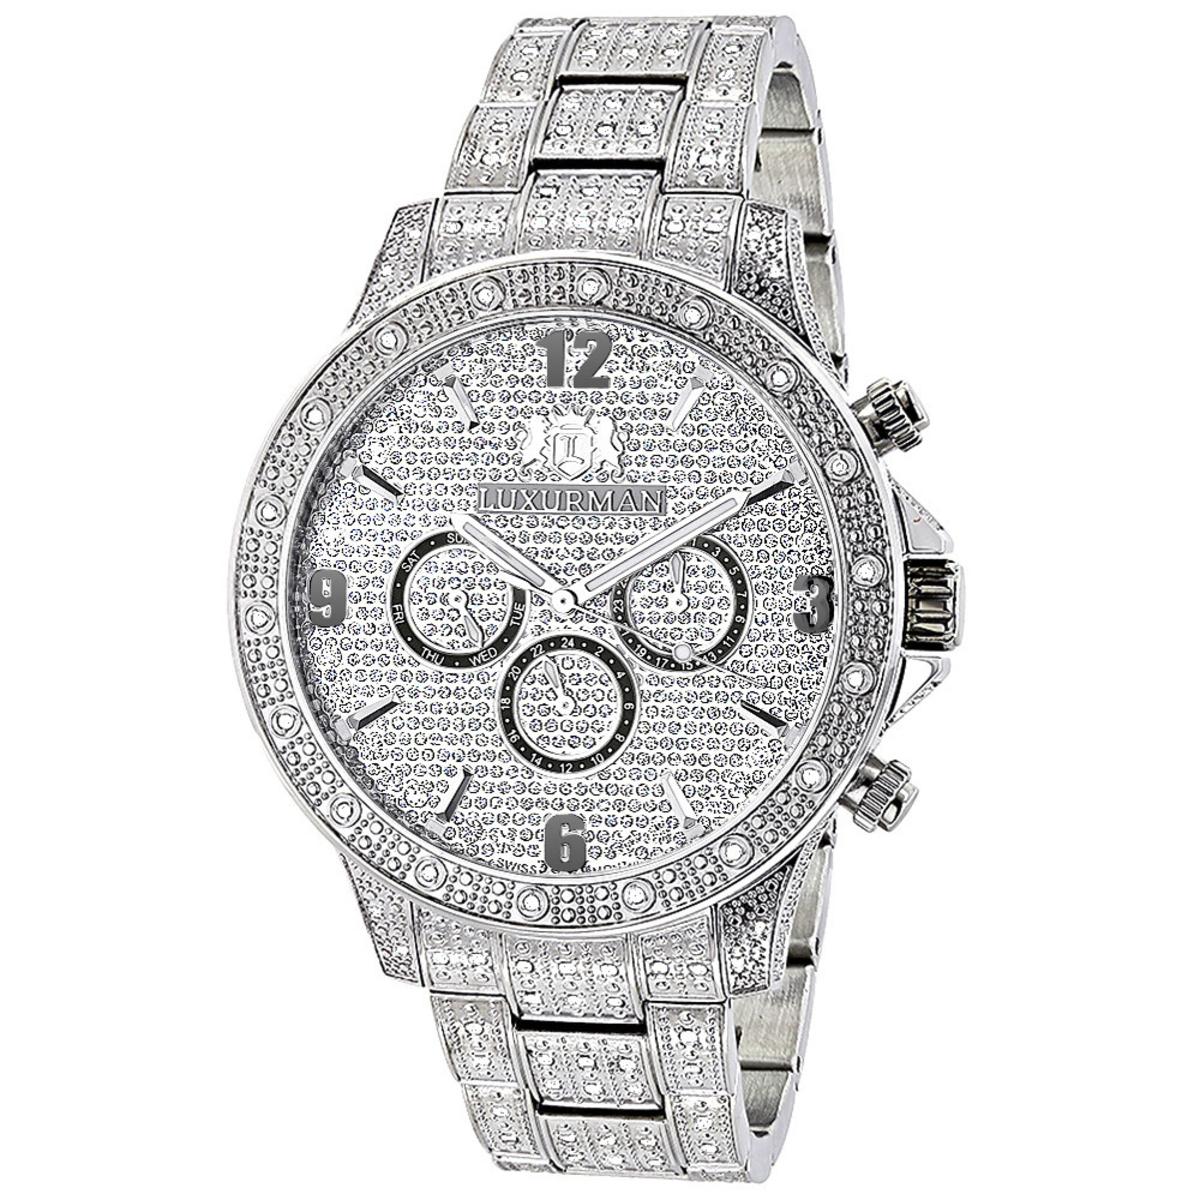 Luxurman Mens Diamond Watches: Swiss Quartz Fully Iced Out Watch 1.25ct